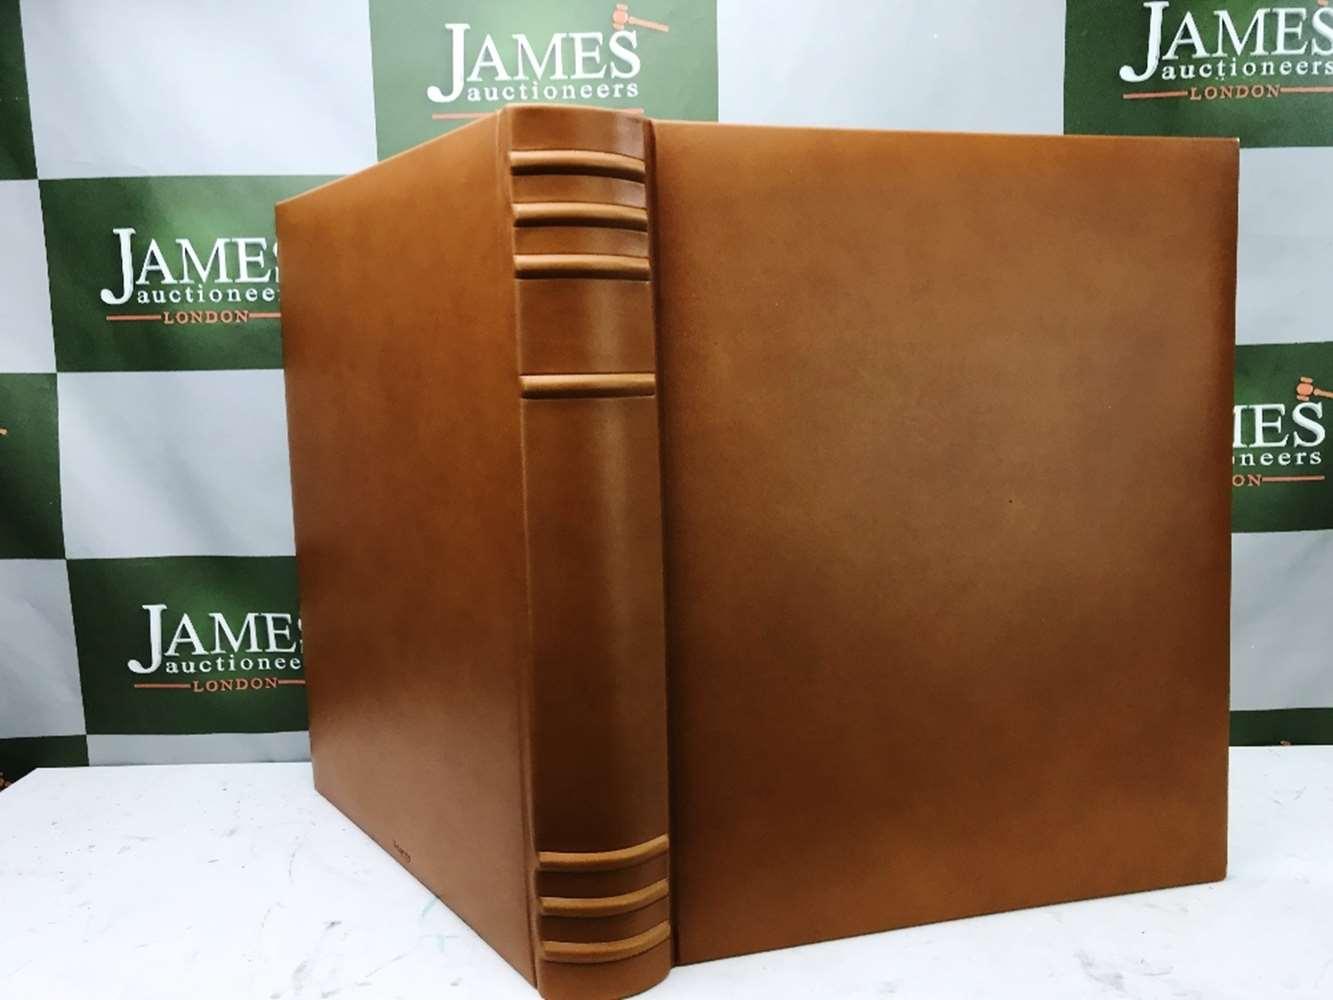 Lot 31 - Asprey & Co - New Tan Leather Photo Album-Large 13 x 11 Inch